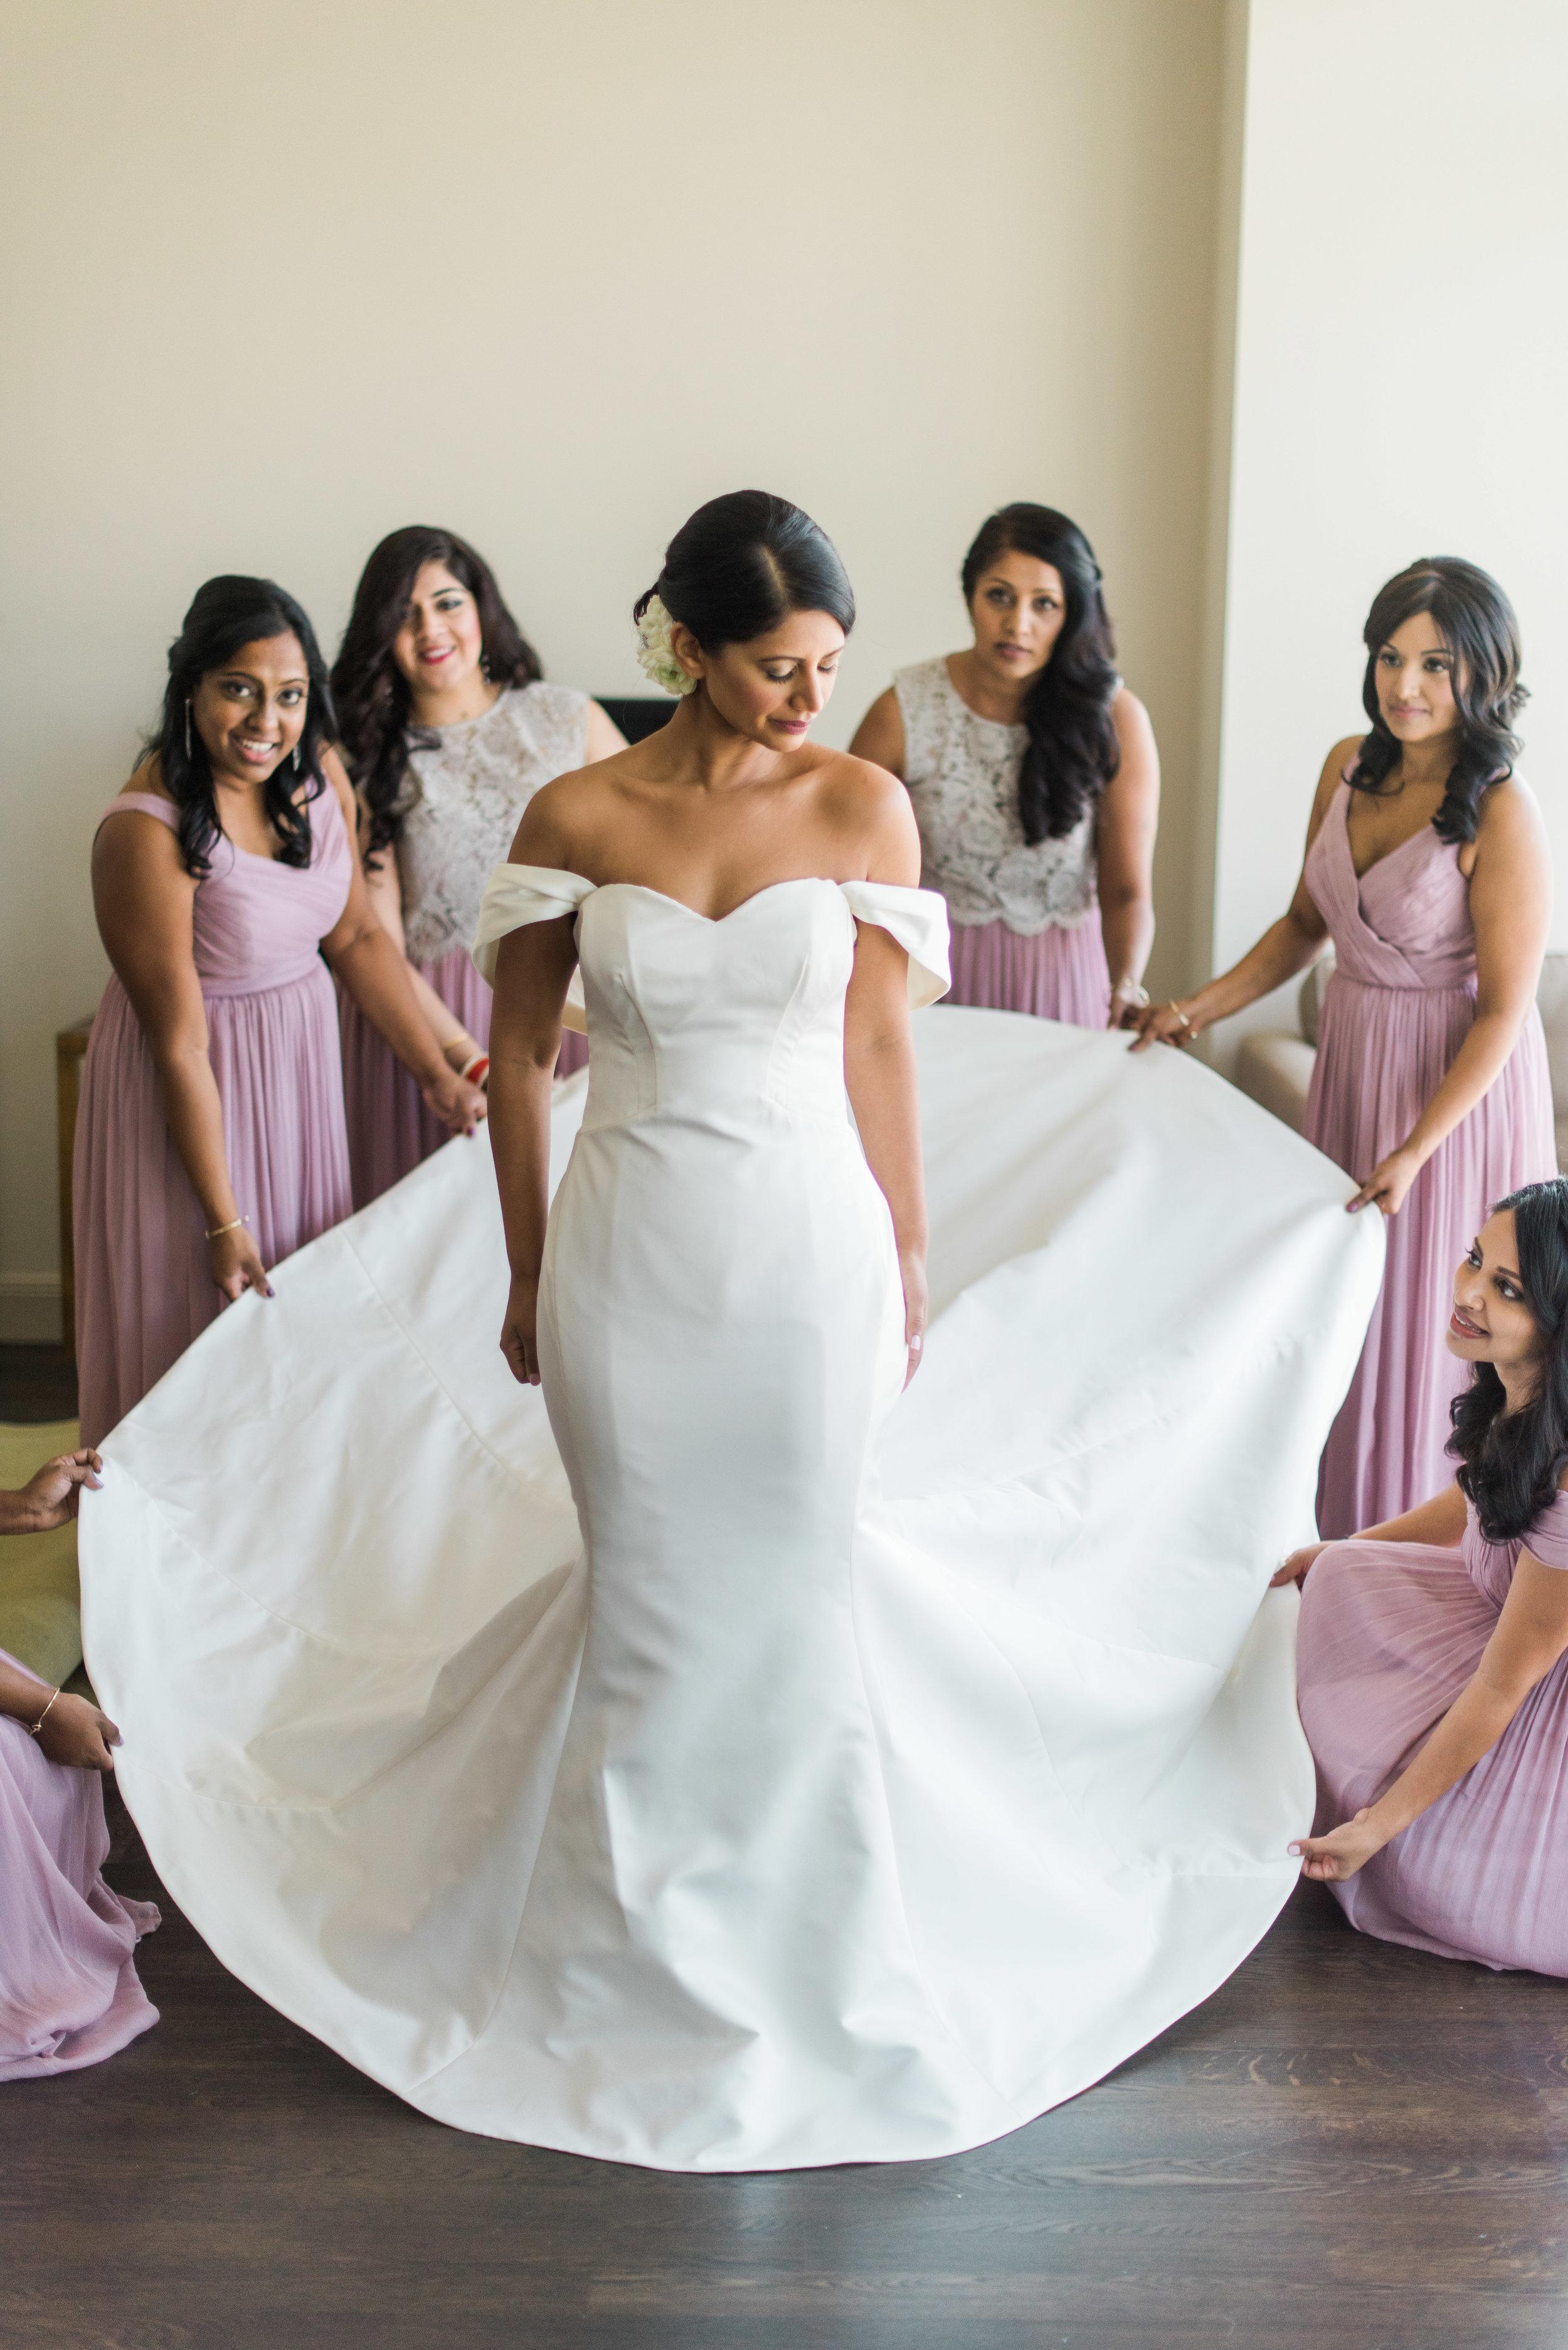 Fine-Art-Film-Houston-Wedding-Photographer-Best-Top-Luxury-Texas-Austin-Dallas-Destination-Dana-Fernandez-Photography-The-Bell-Tower-on-34th-Indian-4.jpg